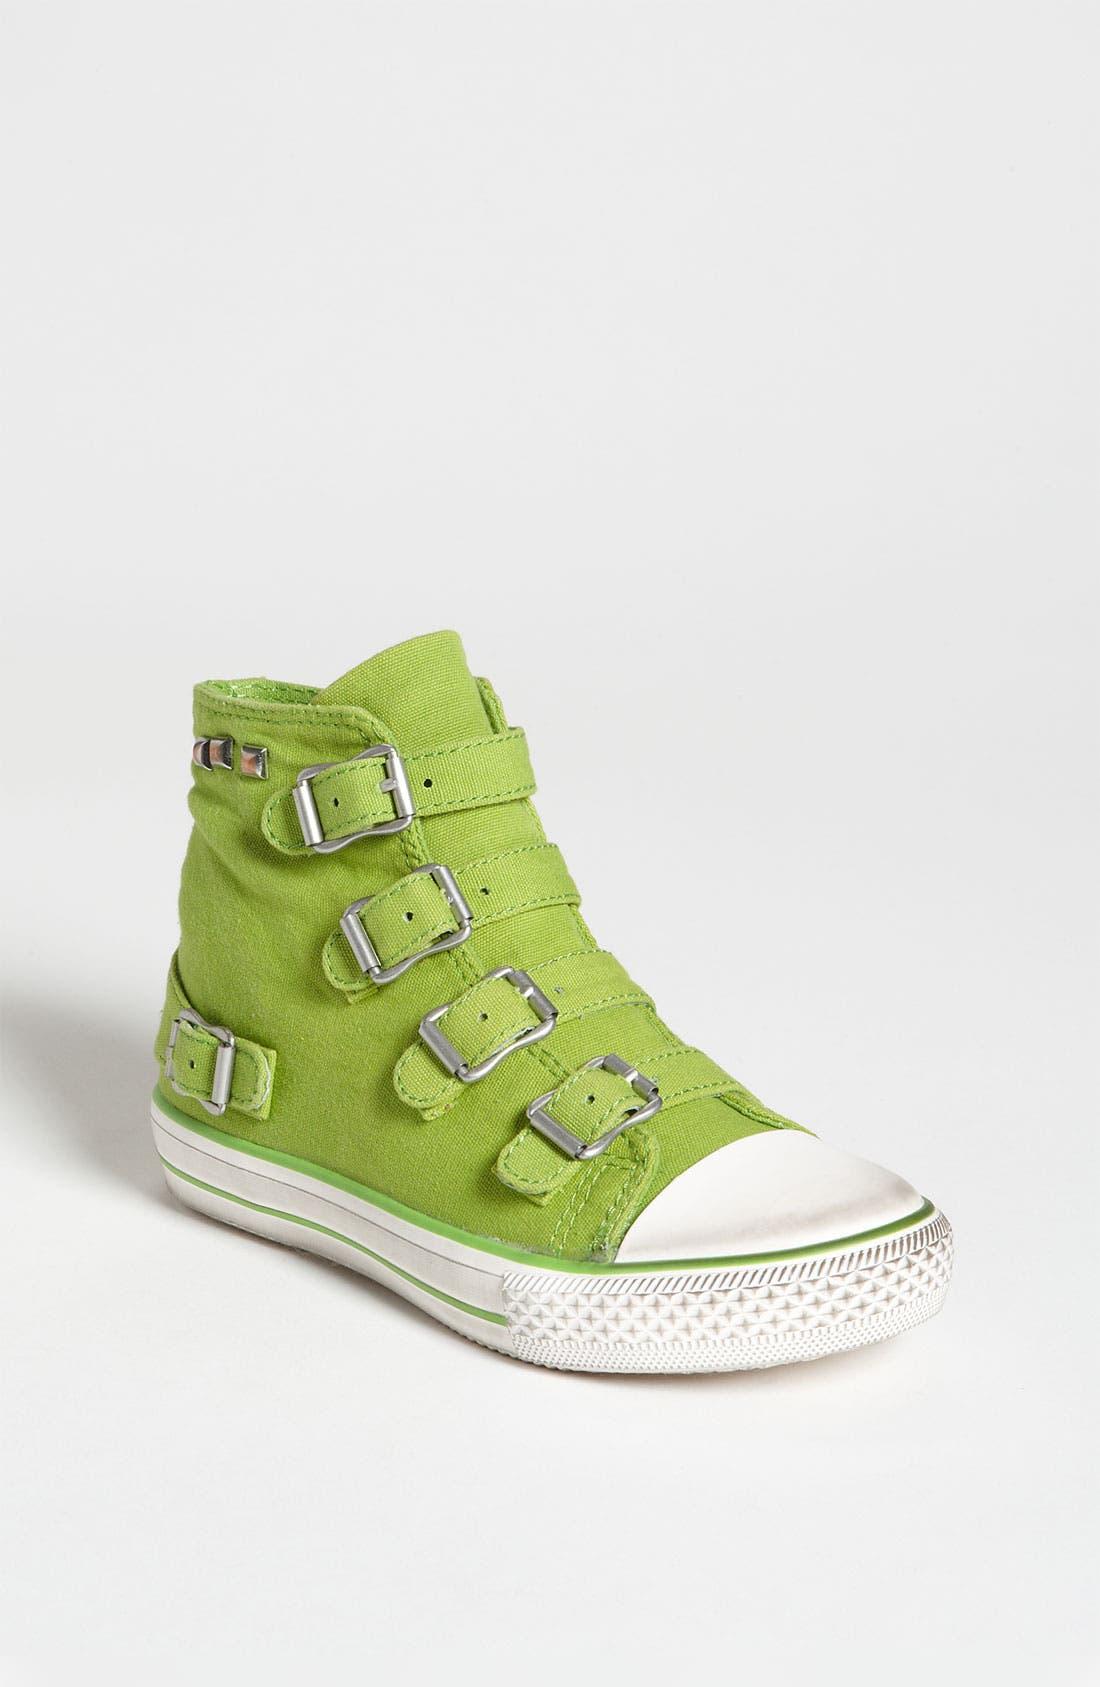 Main Image - Ash 'Flip' High Top Sneaker (Toddler, Little Kid & Big Kid)